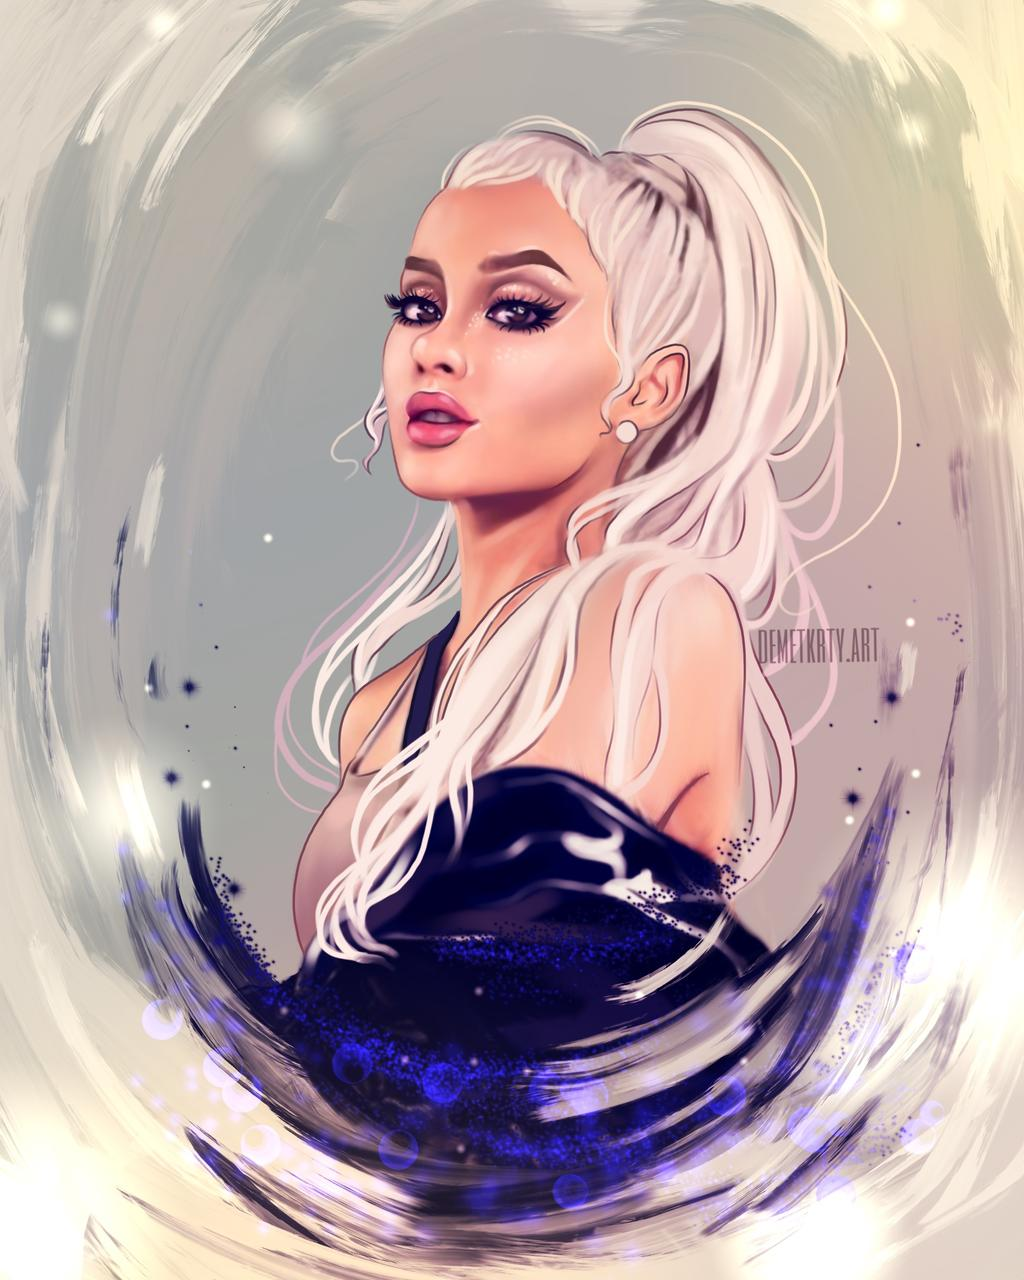 Ariana Grande ($120 million)